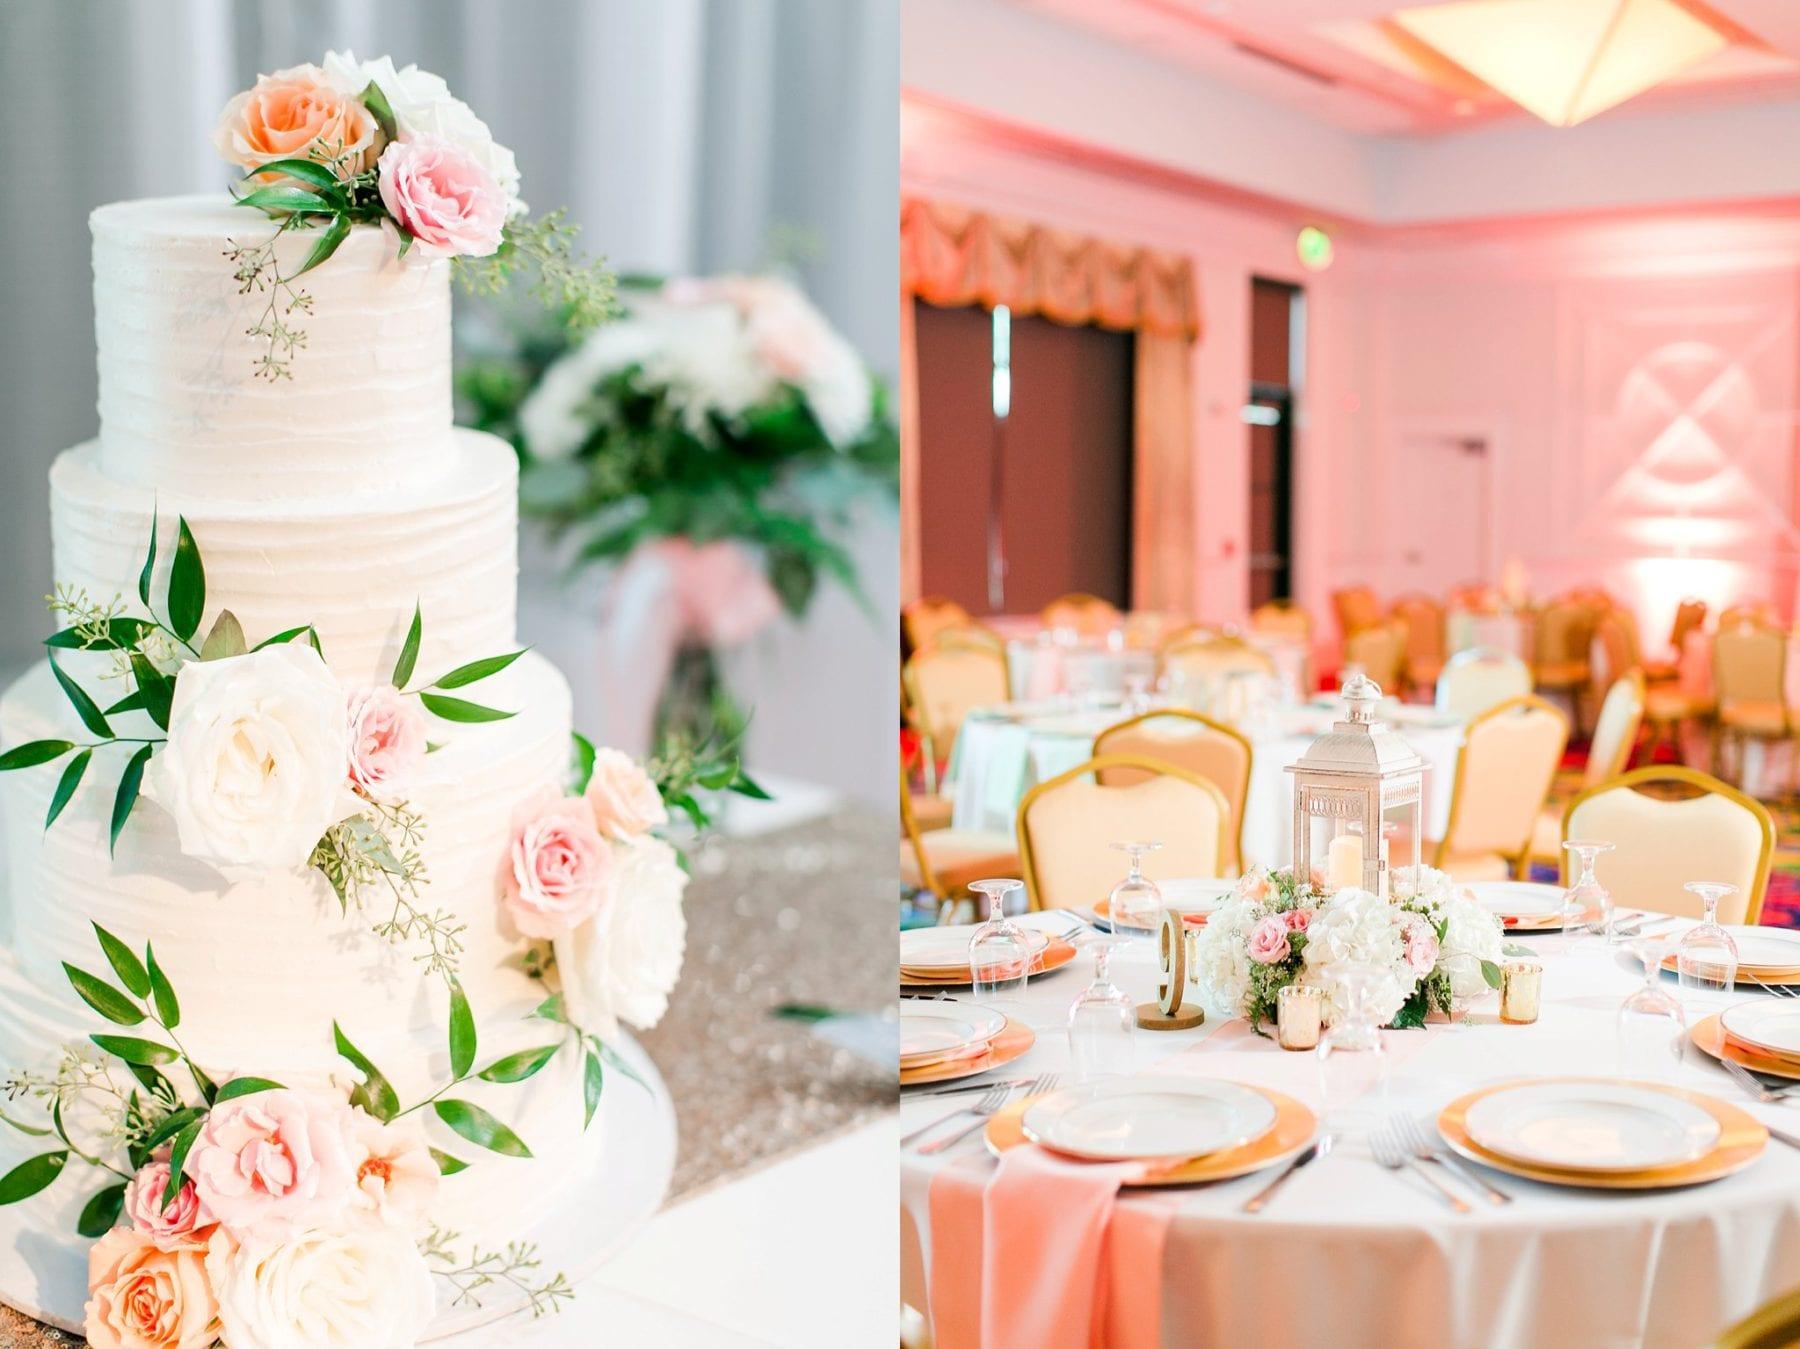 Waters Edge Wedding Photos Maryland Wedding Photographer Megan Kelsey Photography Katie & Conor-289.jpg